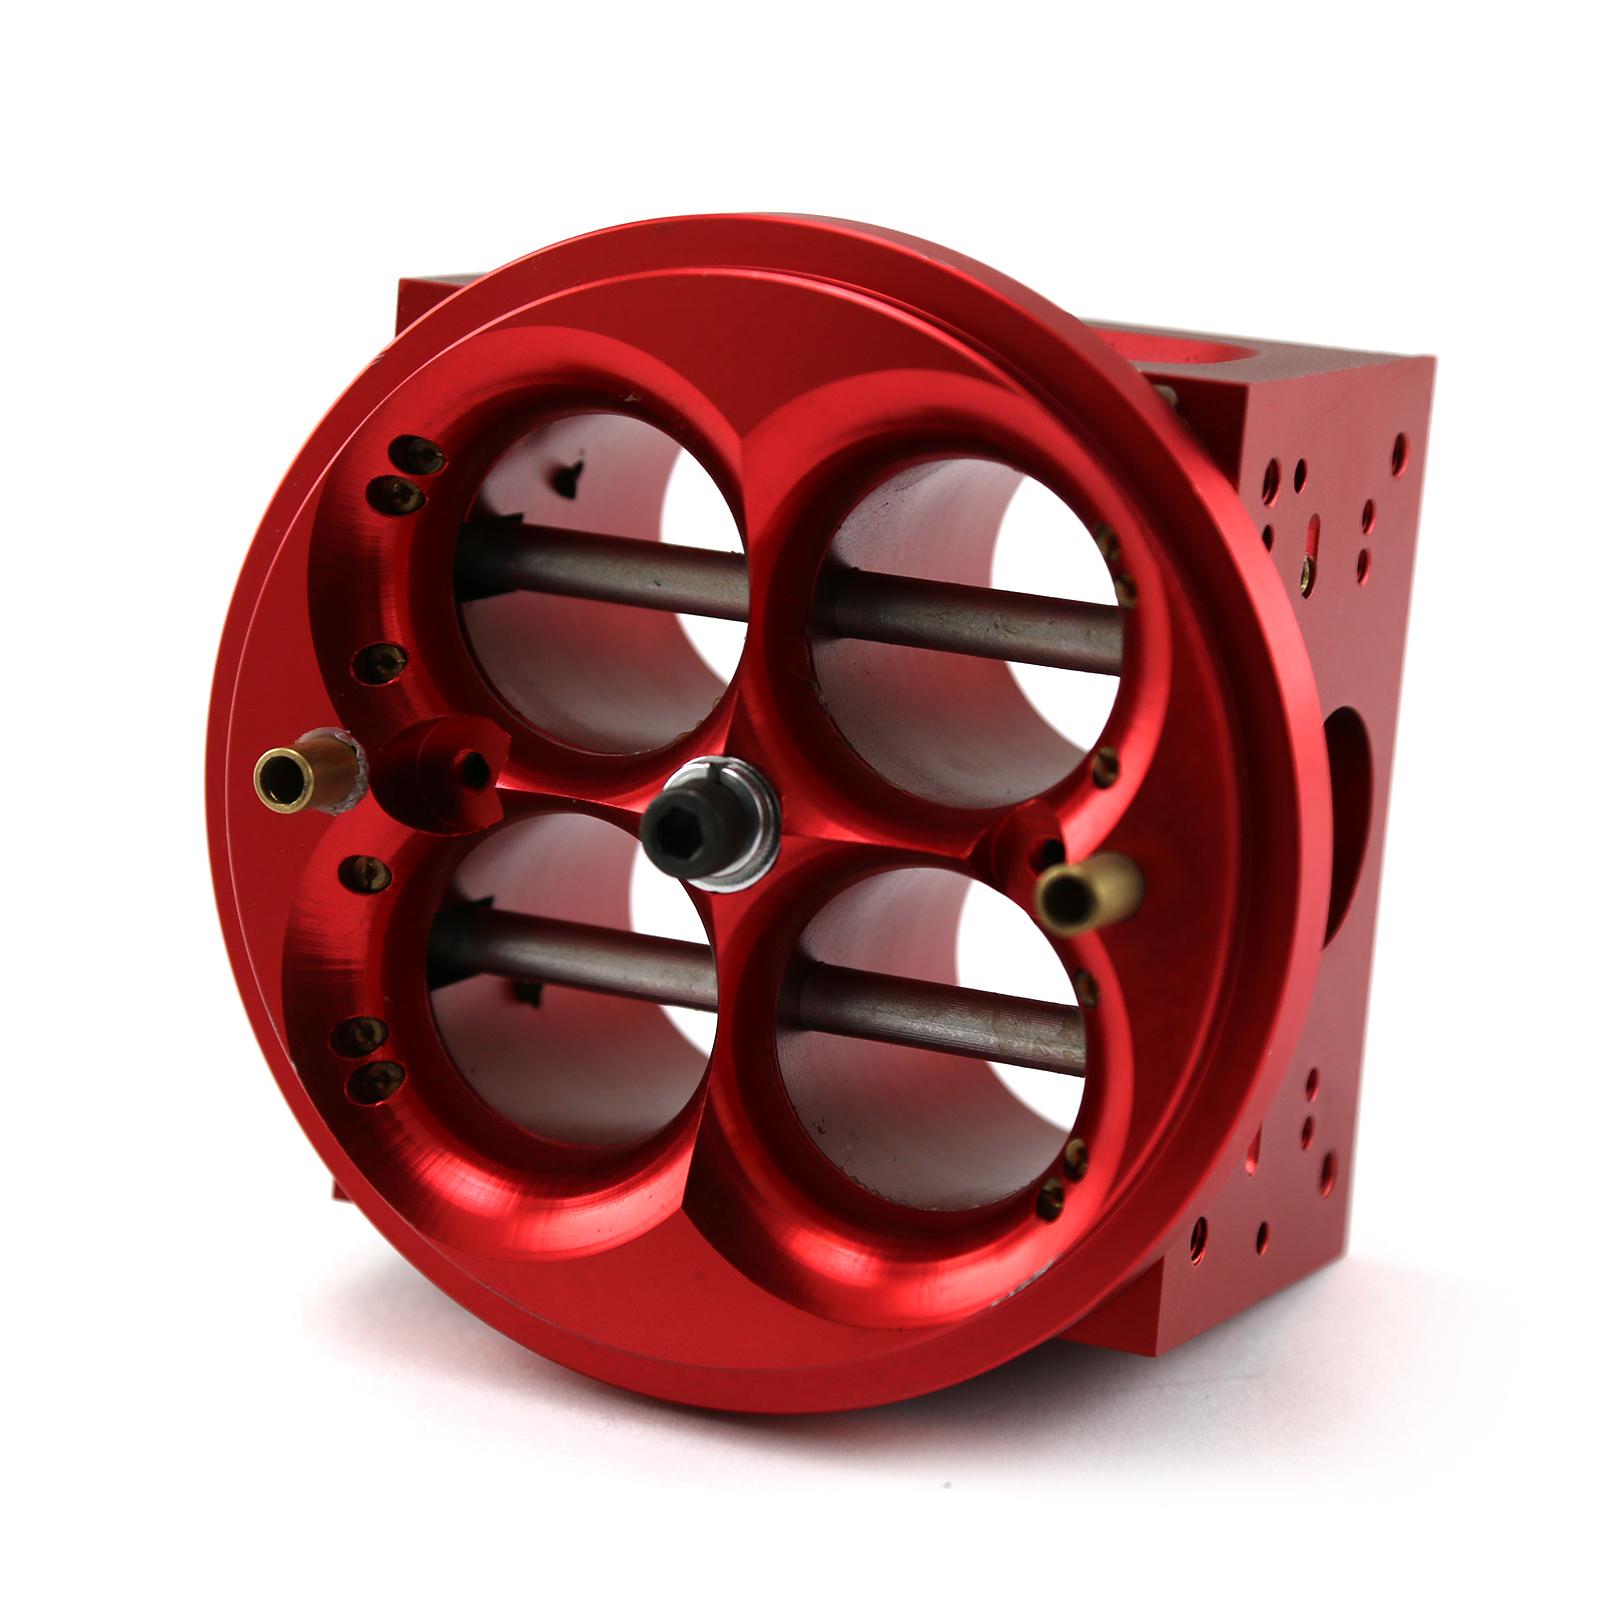 PCE® PCE116.1006 4 Barrel Billet Aluminum Carburetor Main Body - 4150 Double Pumper [Red]